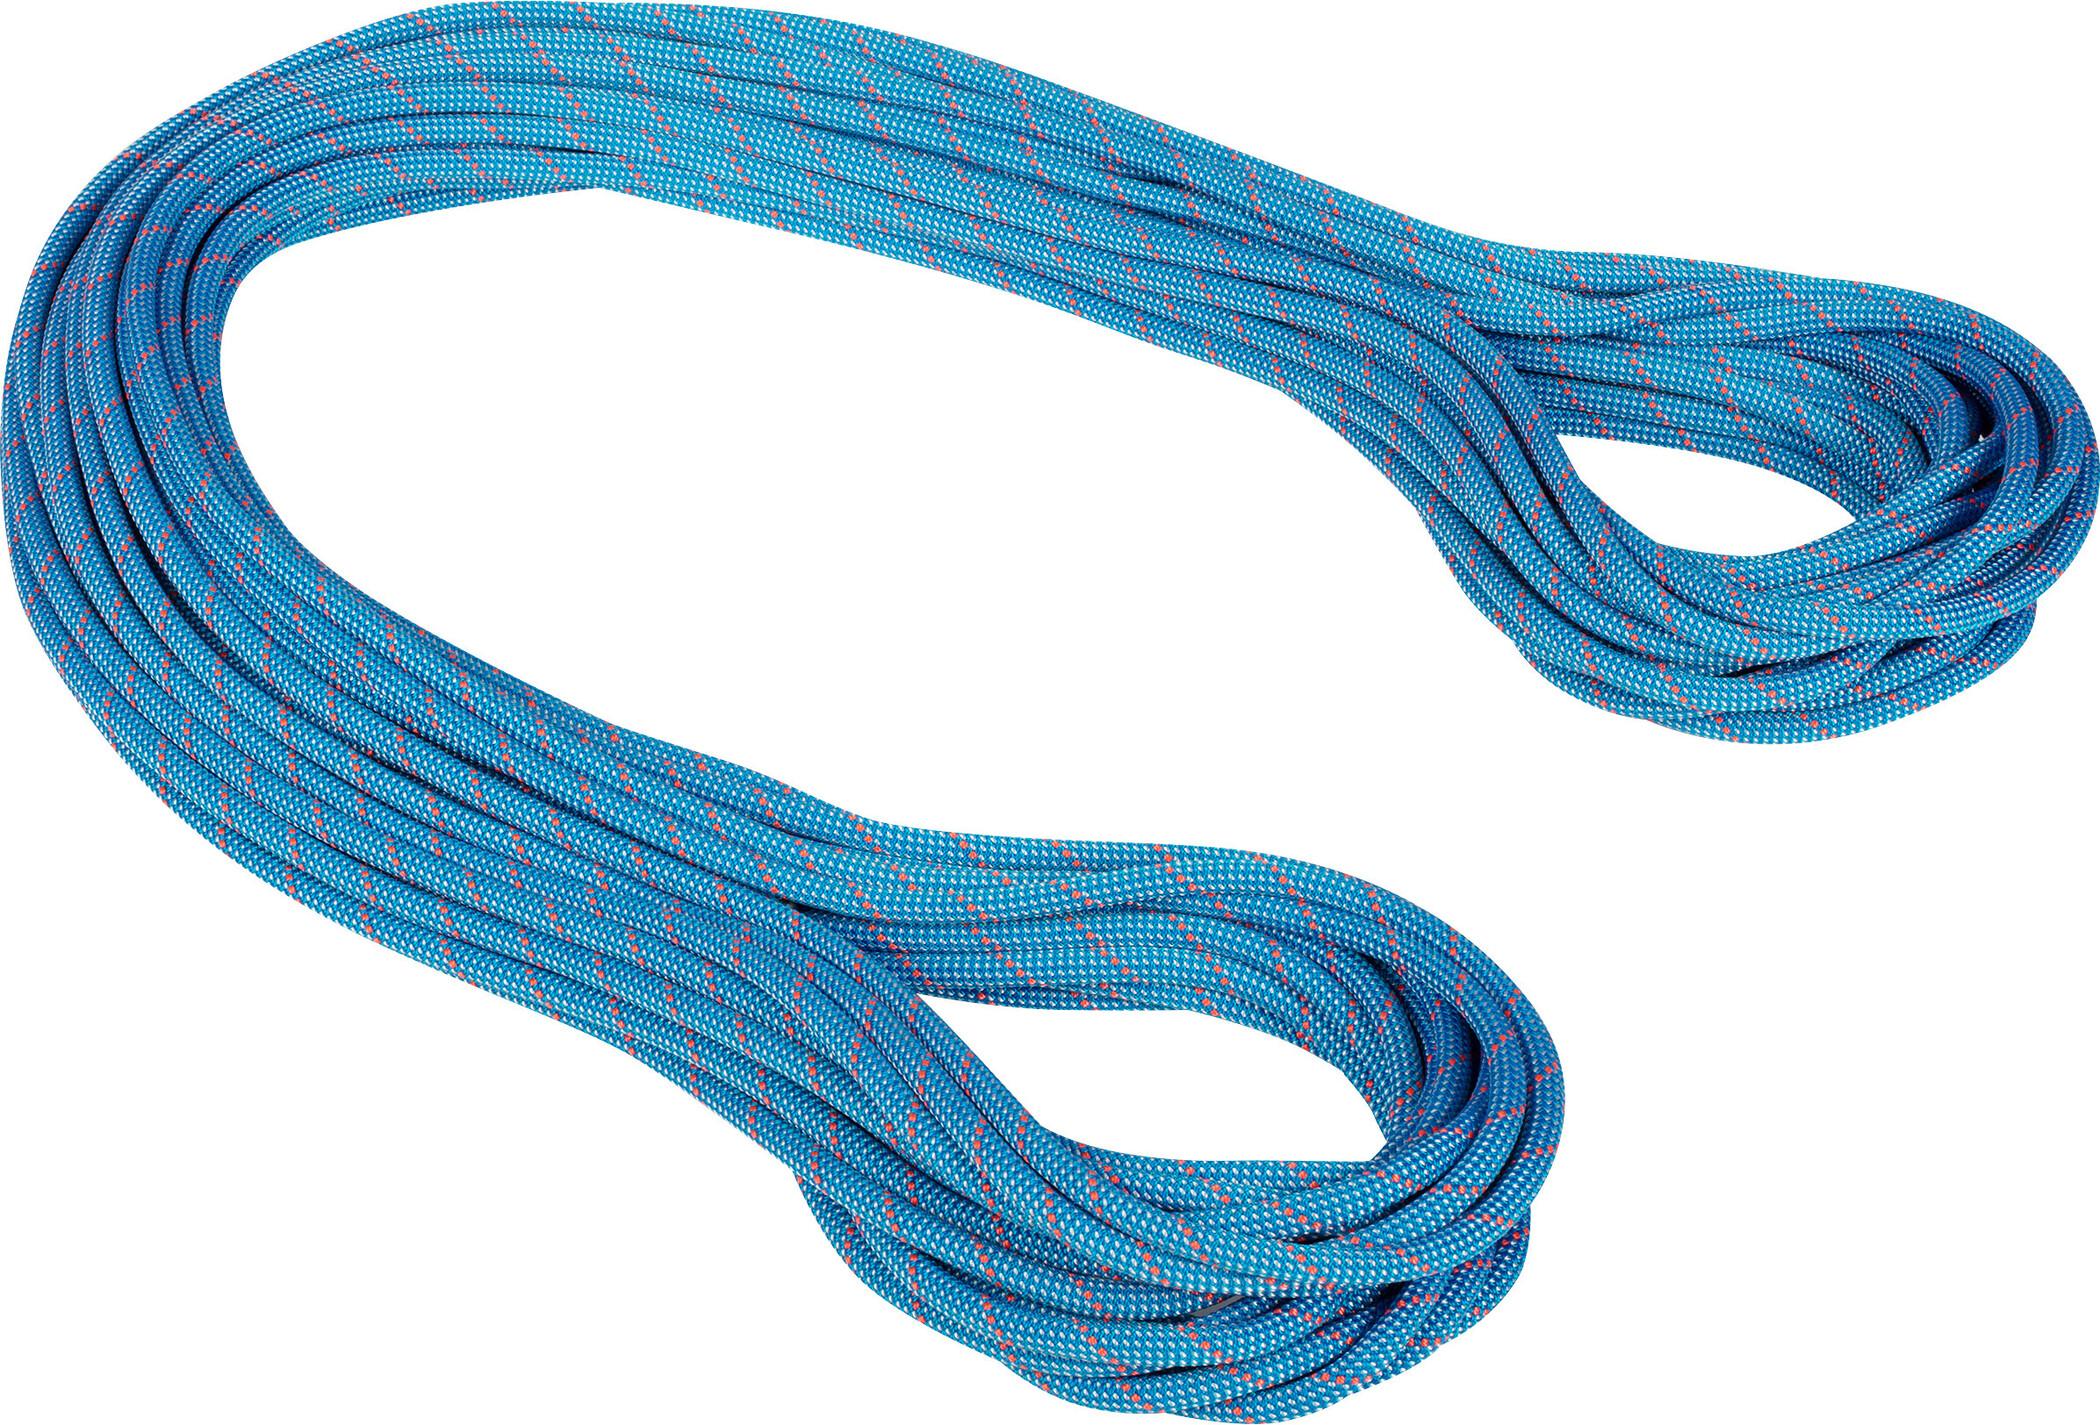 Mystic Boxer quick dry flex  Unterhose MARINE BLUE  CHIEMSEE-KINGS